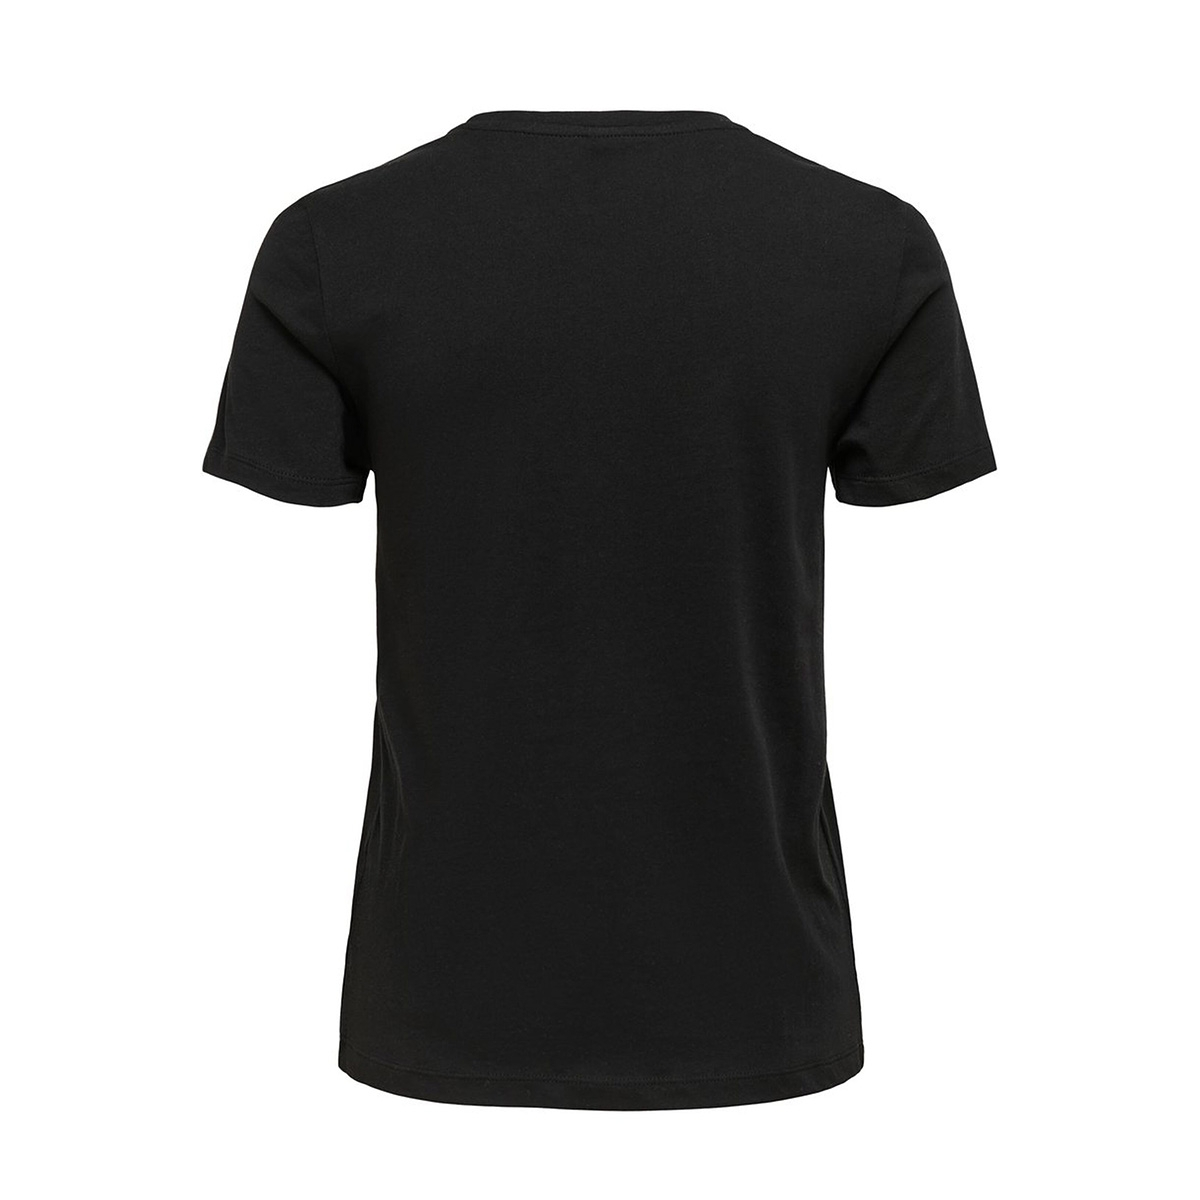 onlkita life reg s/s bee top box co 15199830 only t-shirt black/happy